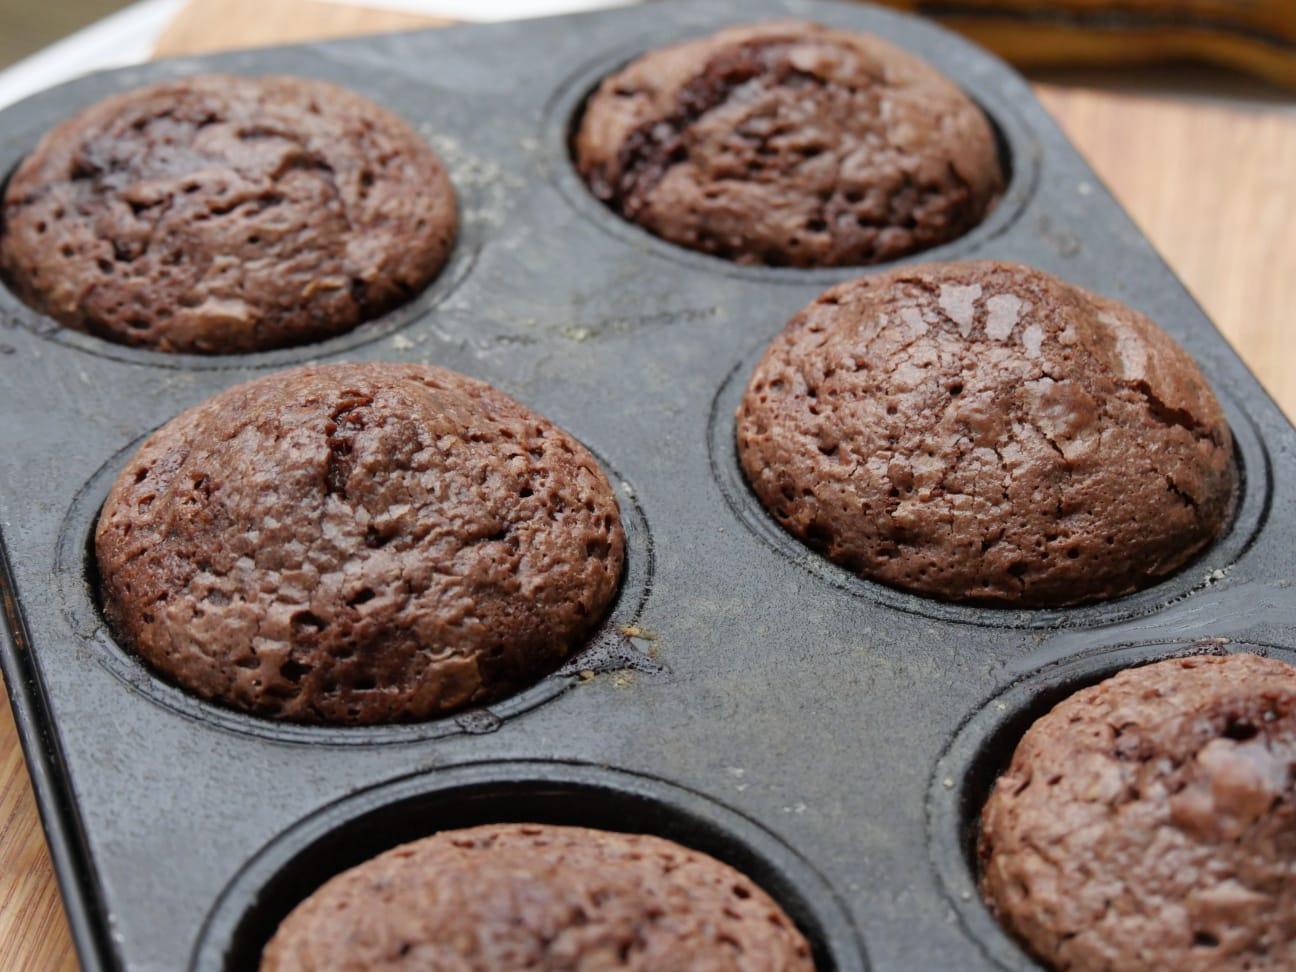 Chocolade BBQ muffin – Moelleux au chocolate